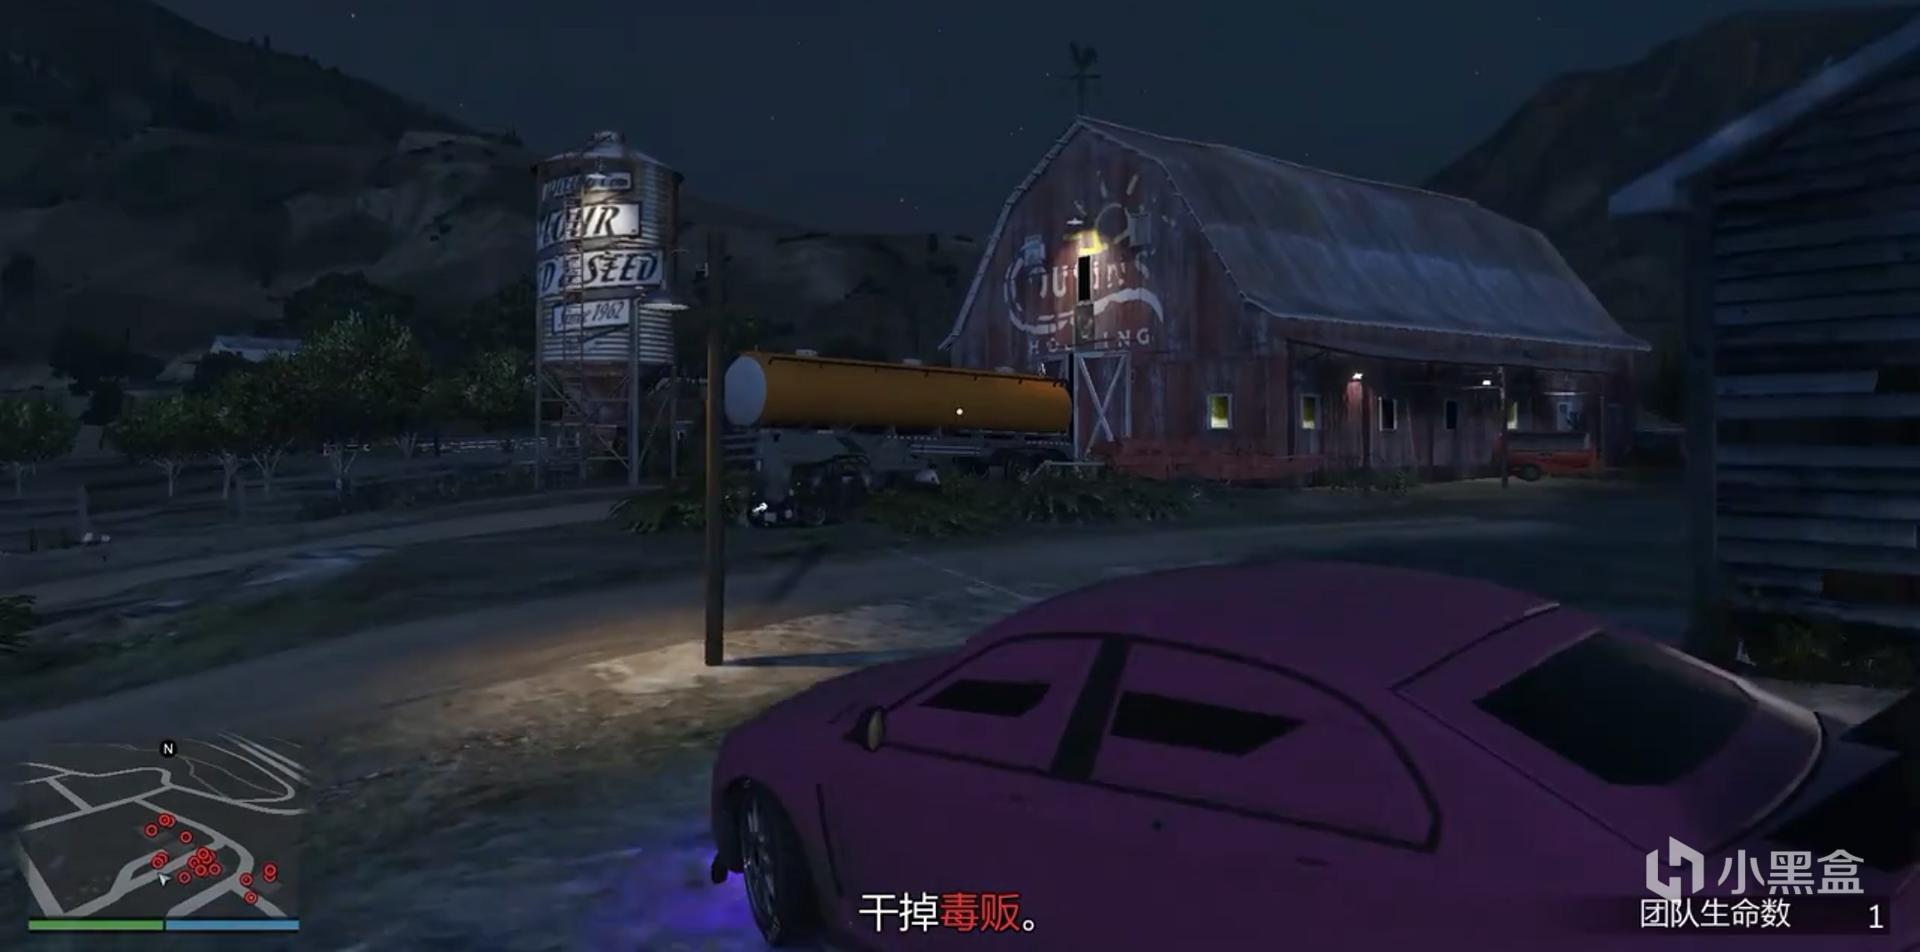 GTA5 首轮募资教程插图37